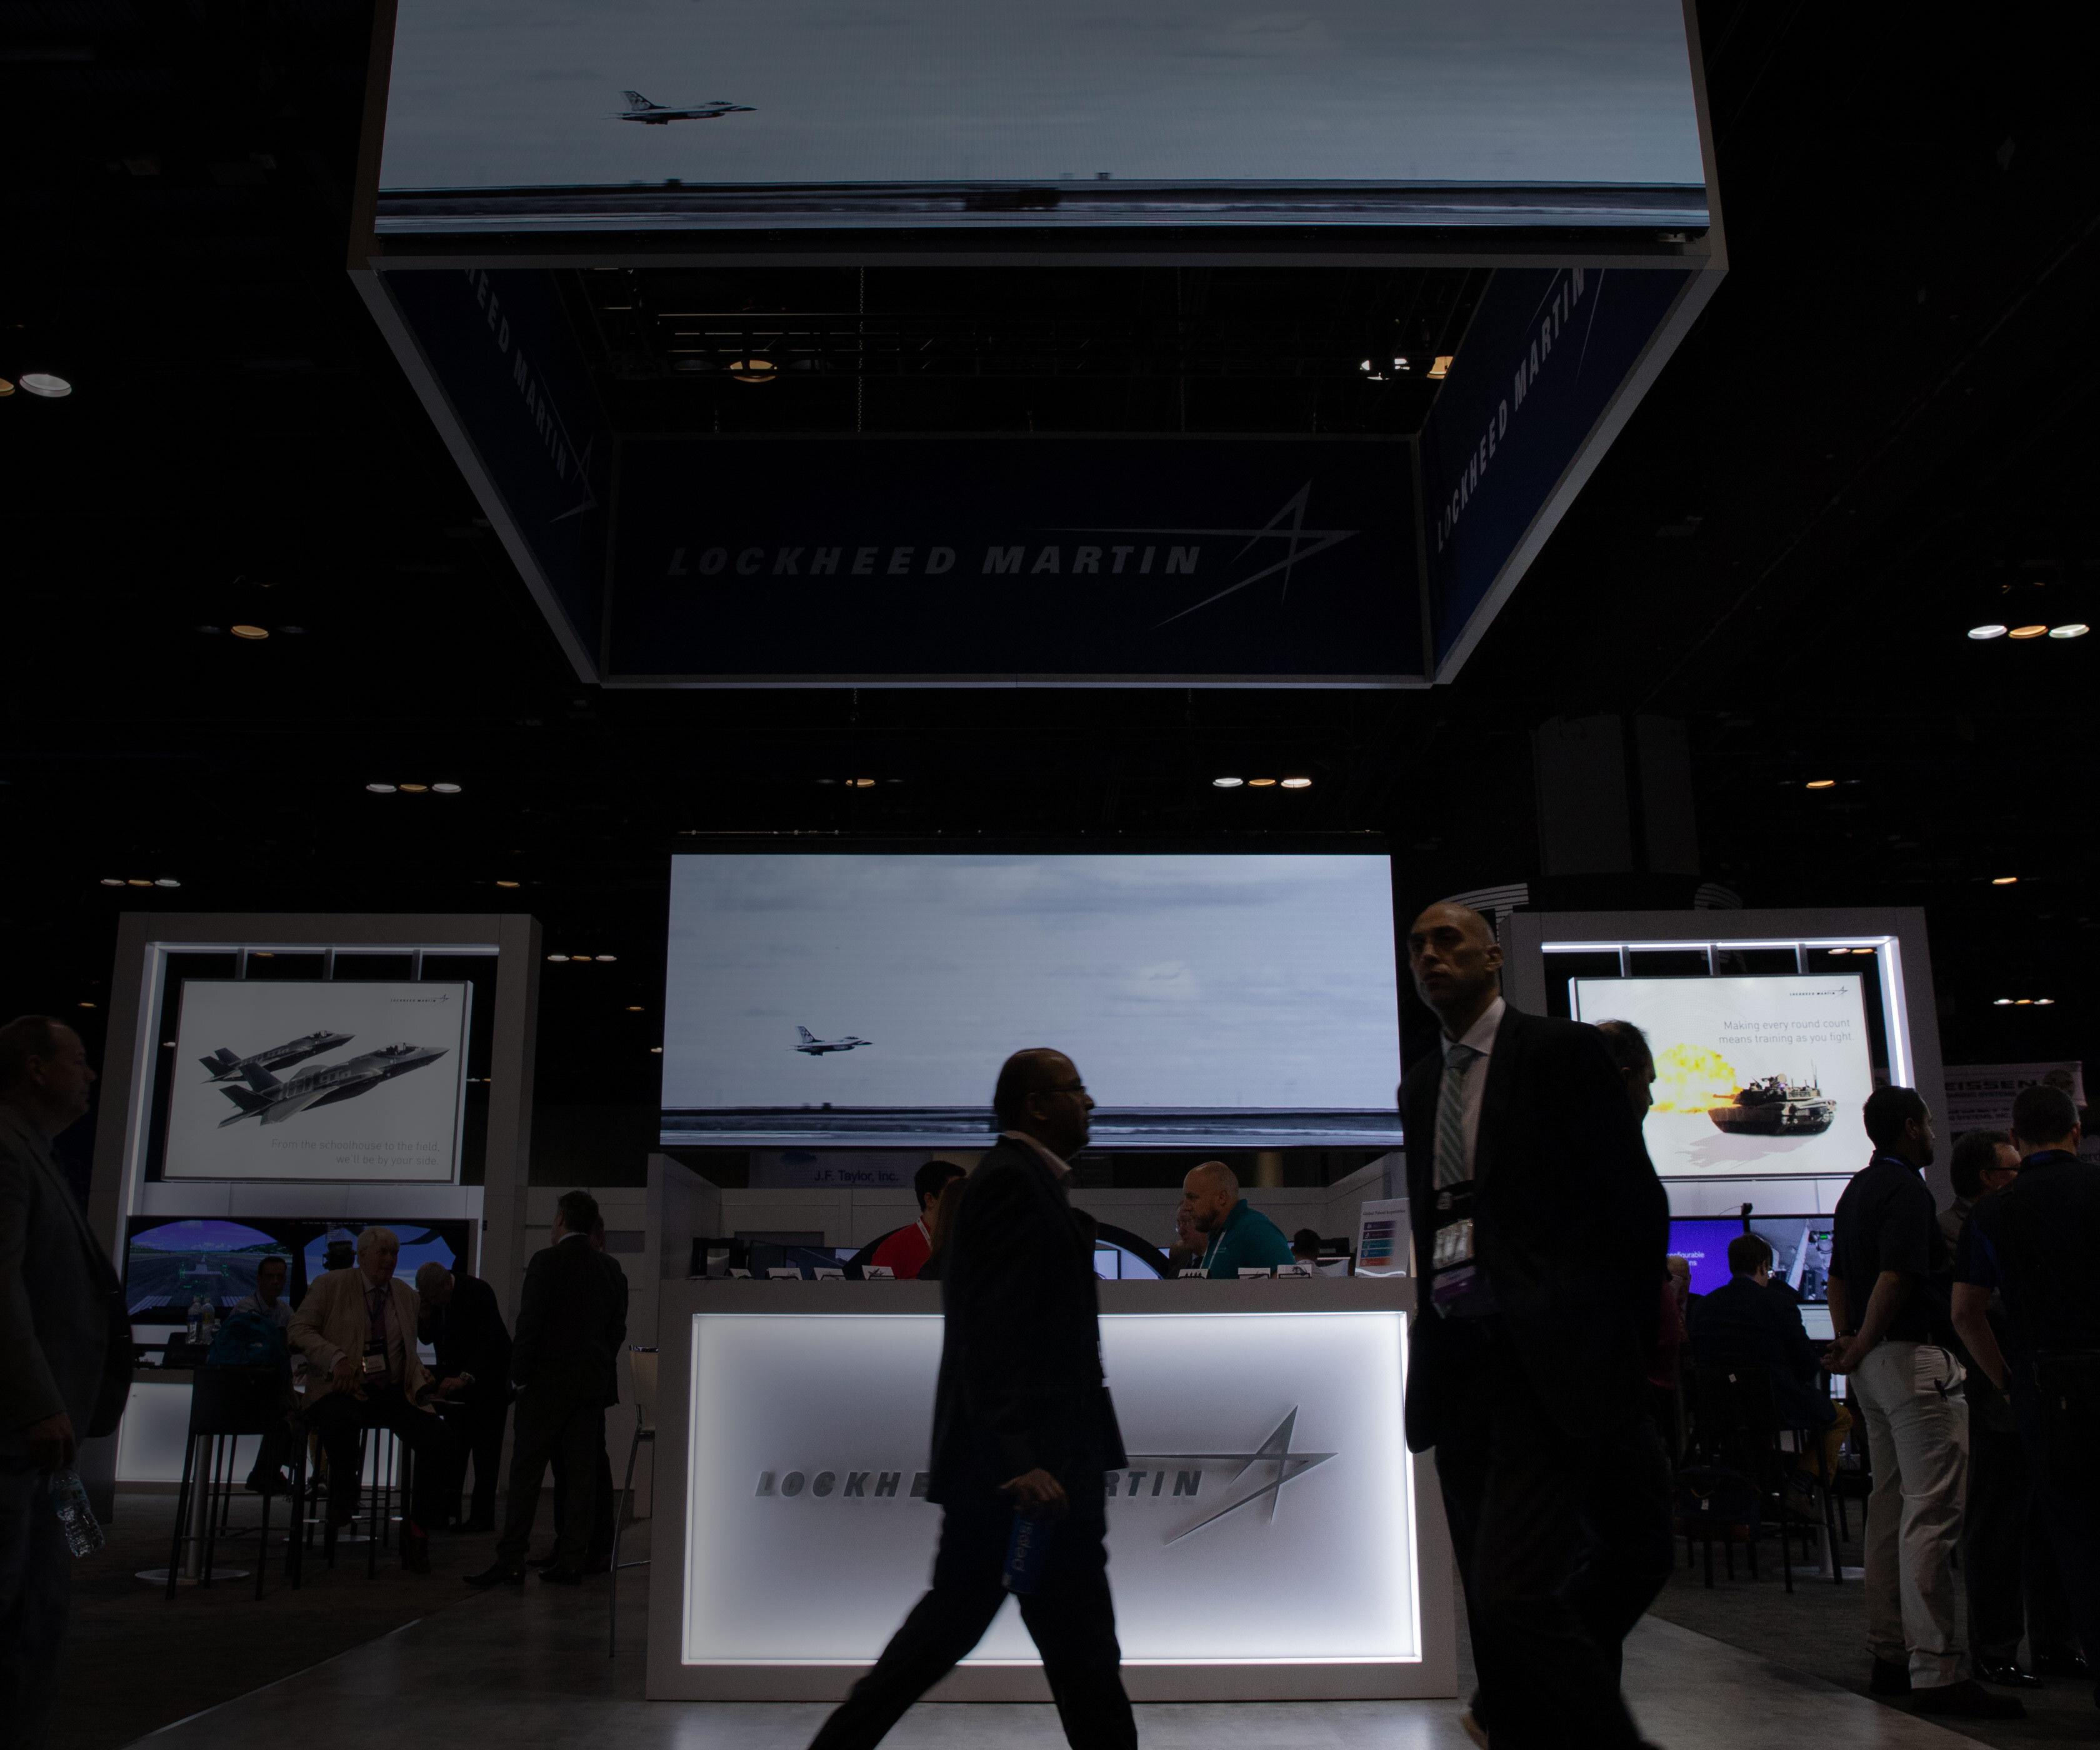 Lockheed Martin Prepar3D supports Varjo virtual and mixed reality